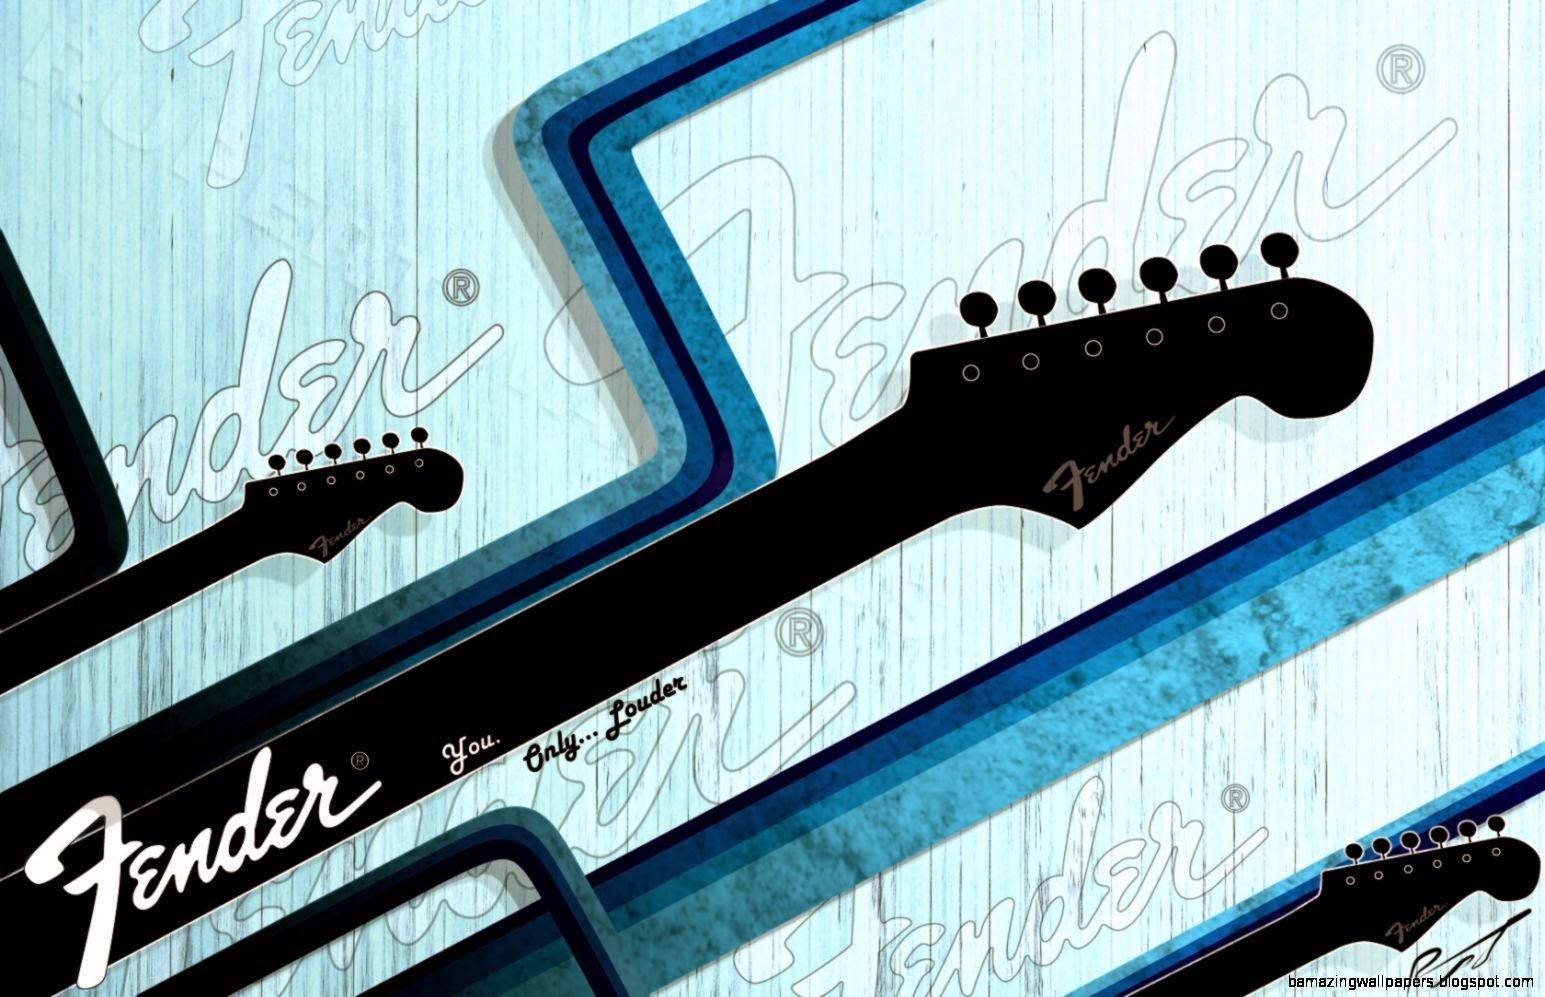 Fender Graphic art Wallpaper by RupertWarries on DeviantArt